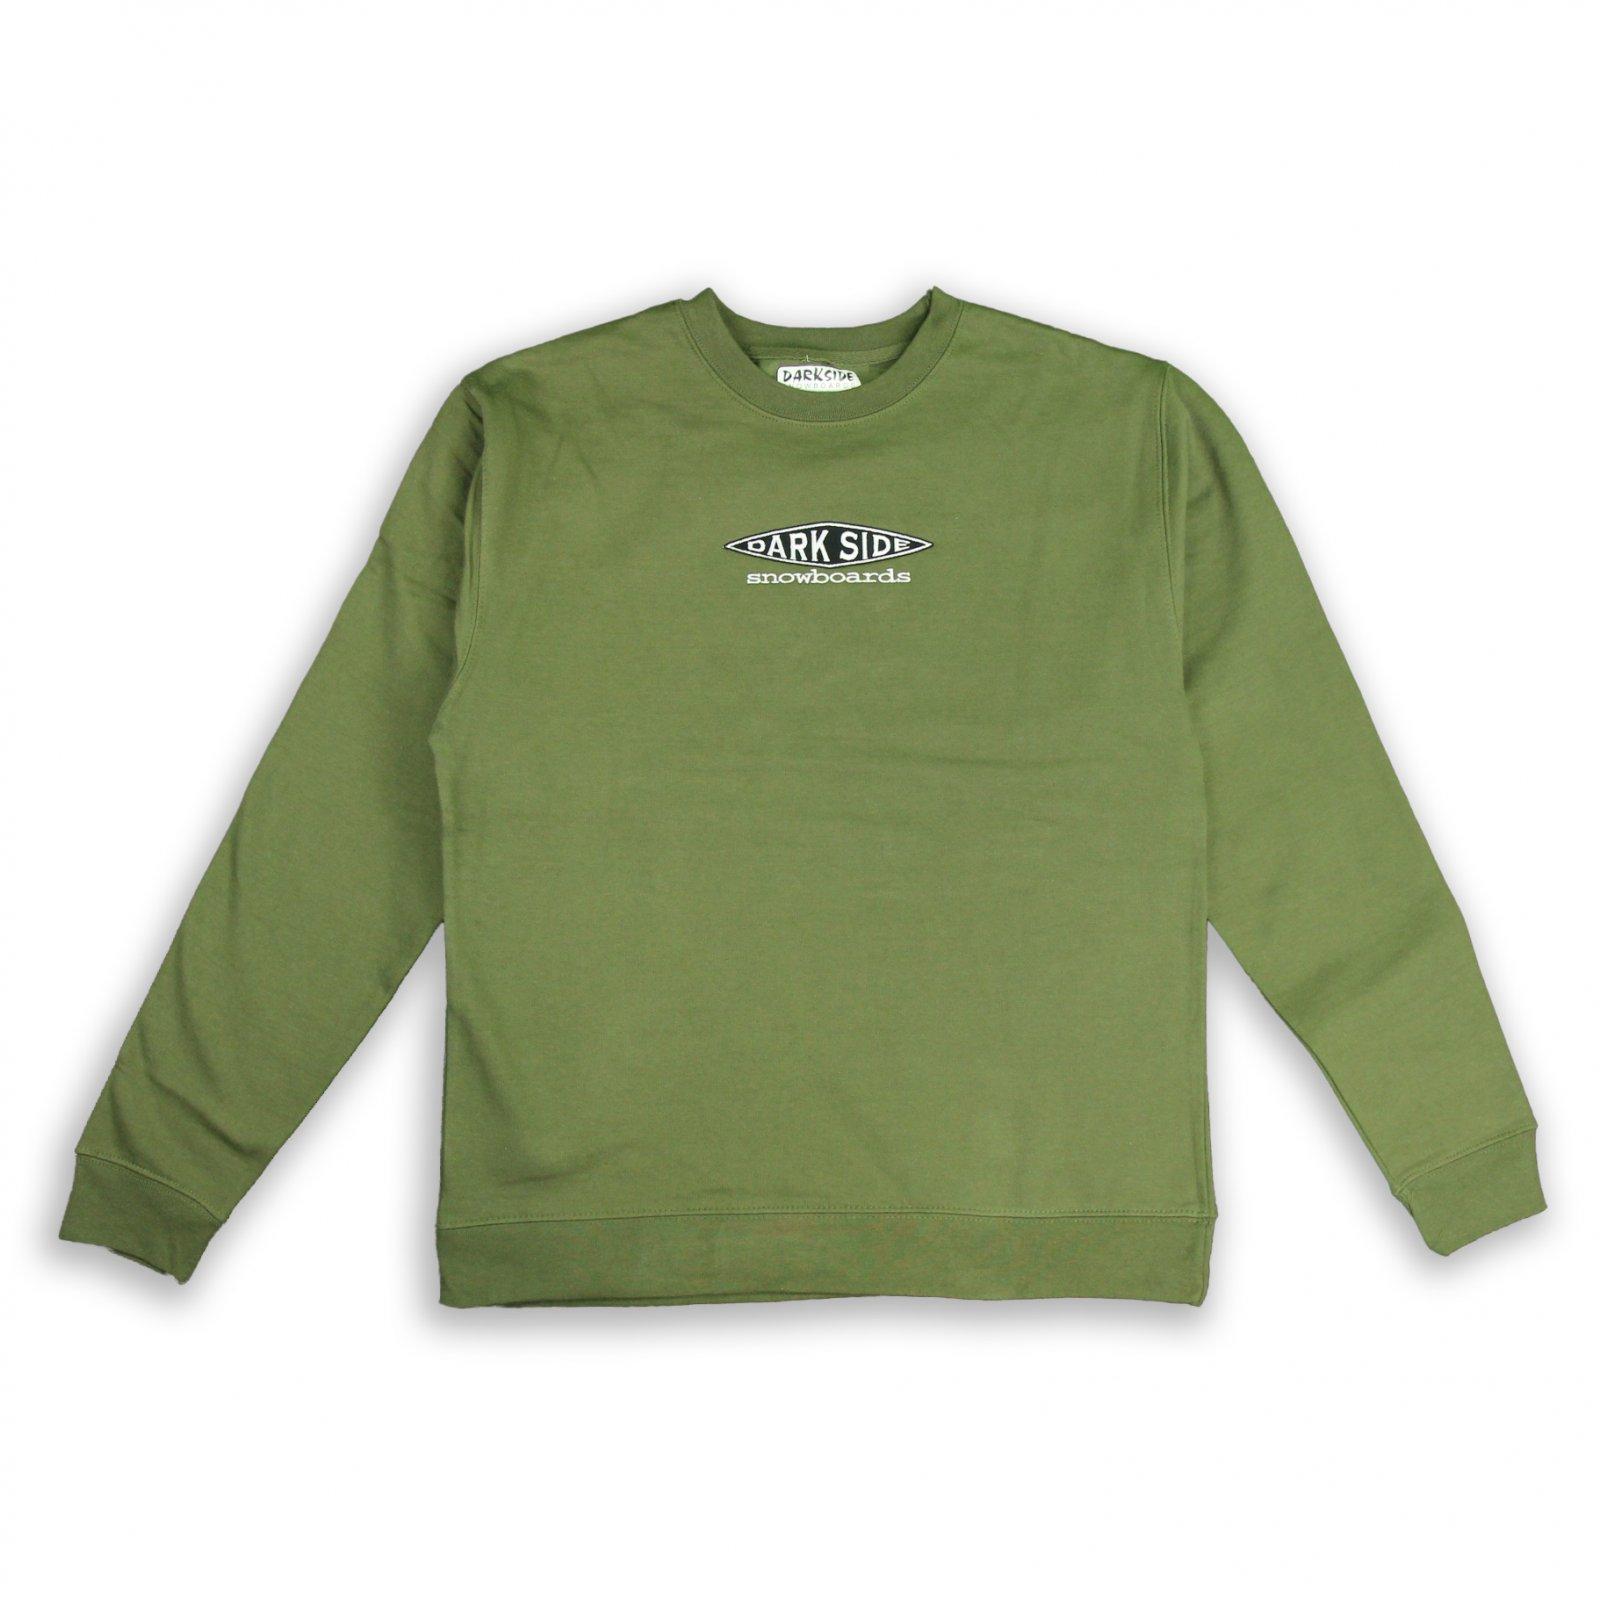 Darkside OG Diamond Embroidered Crew Neck Sweatshirt